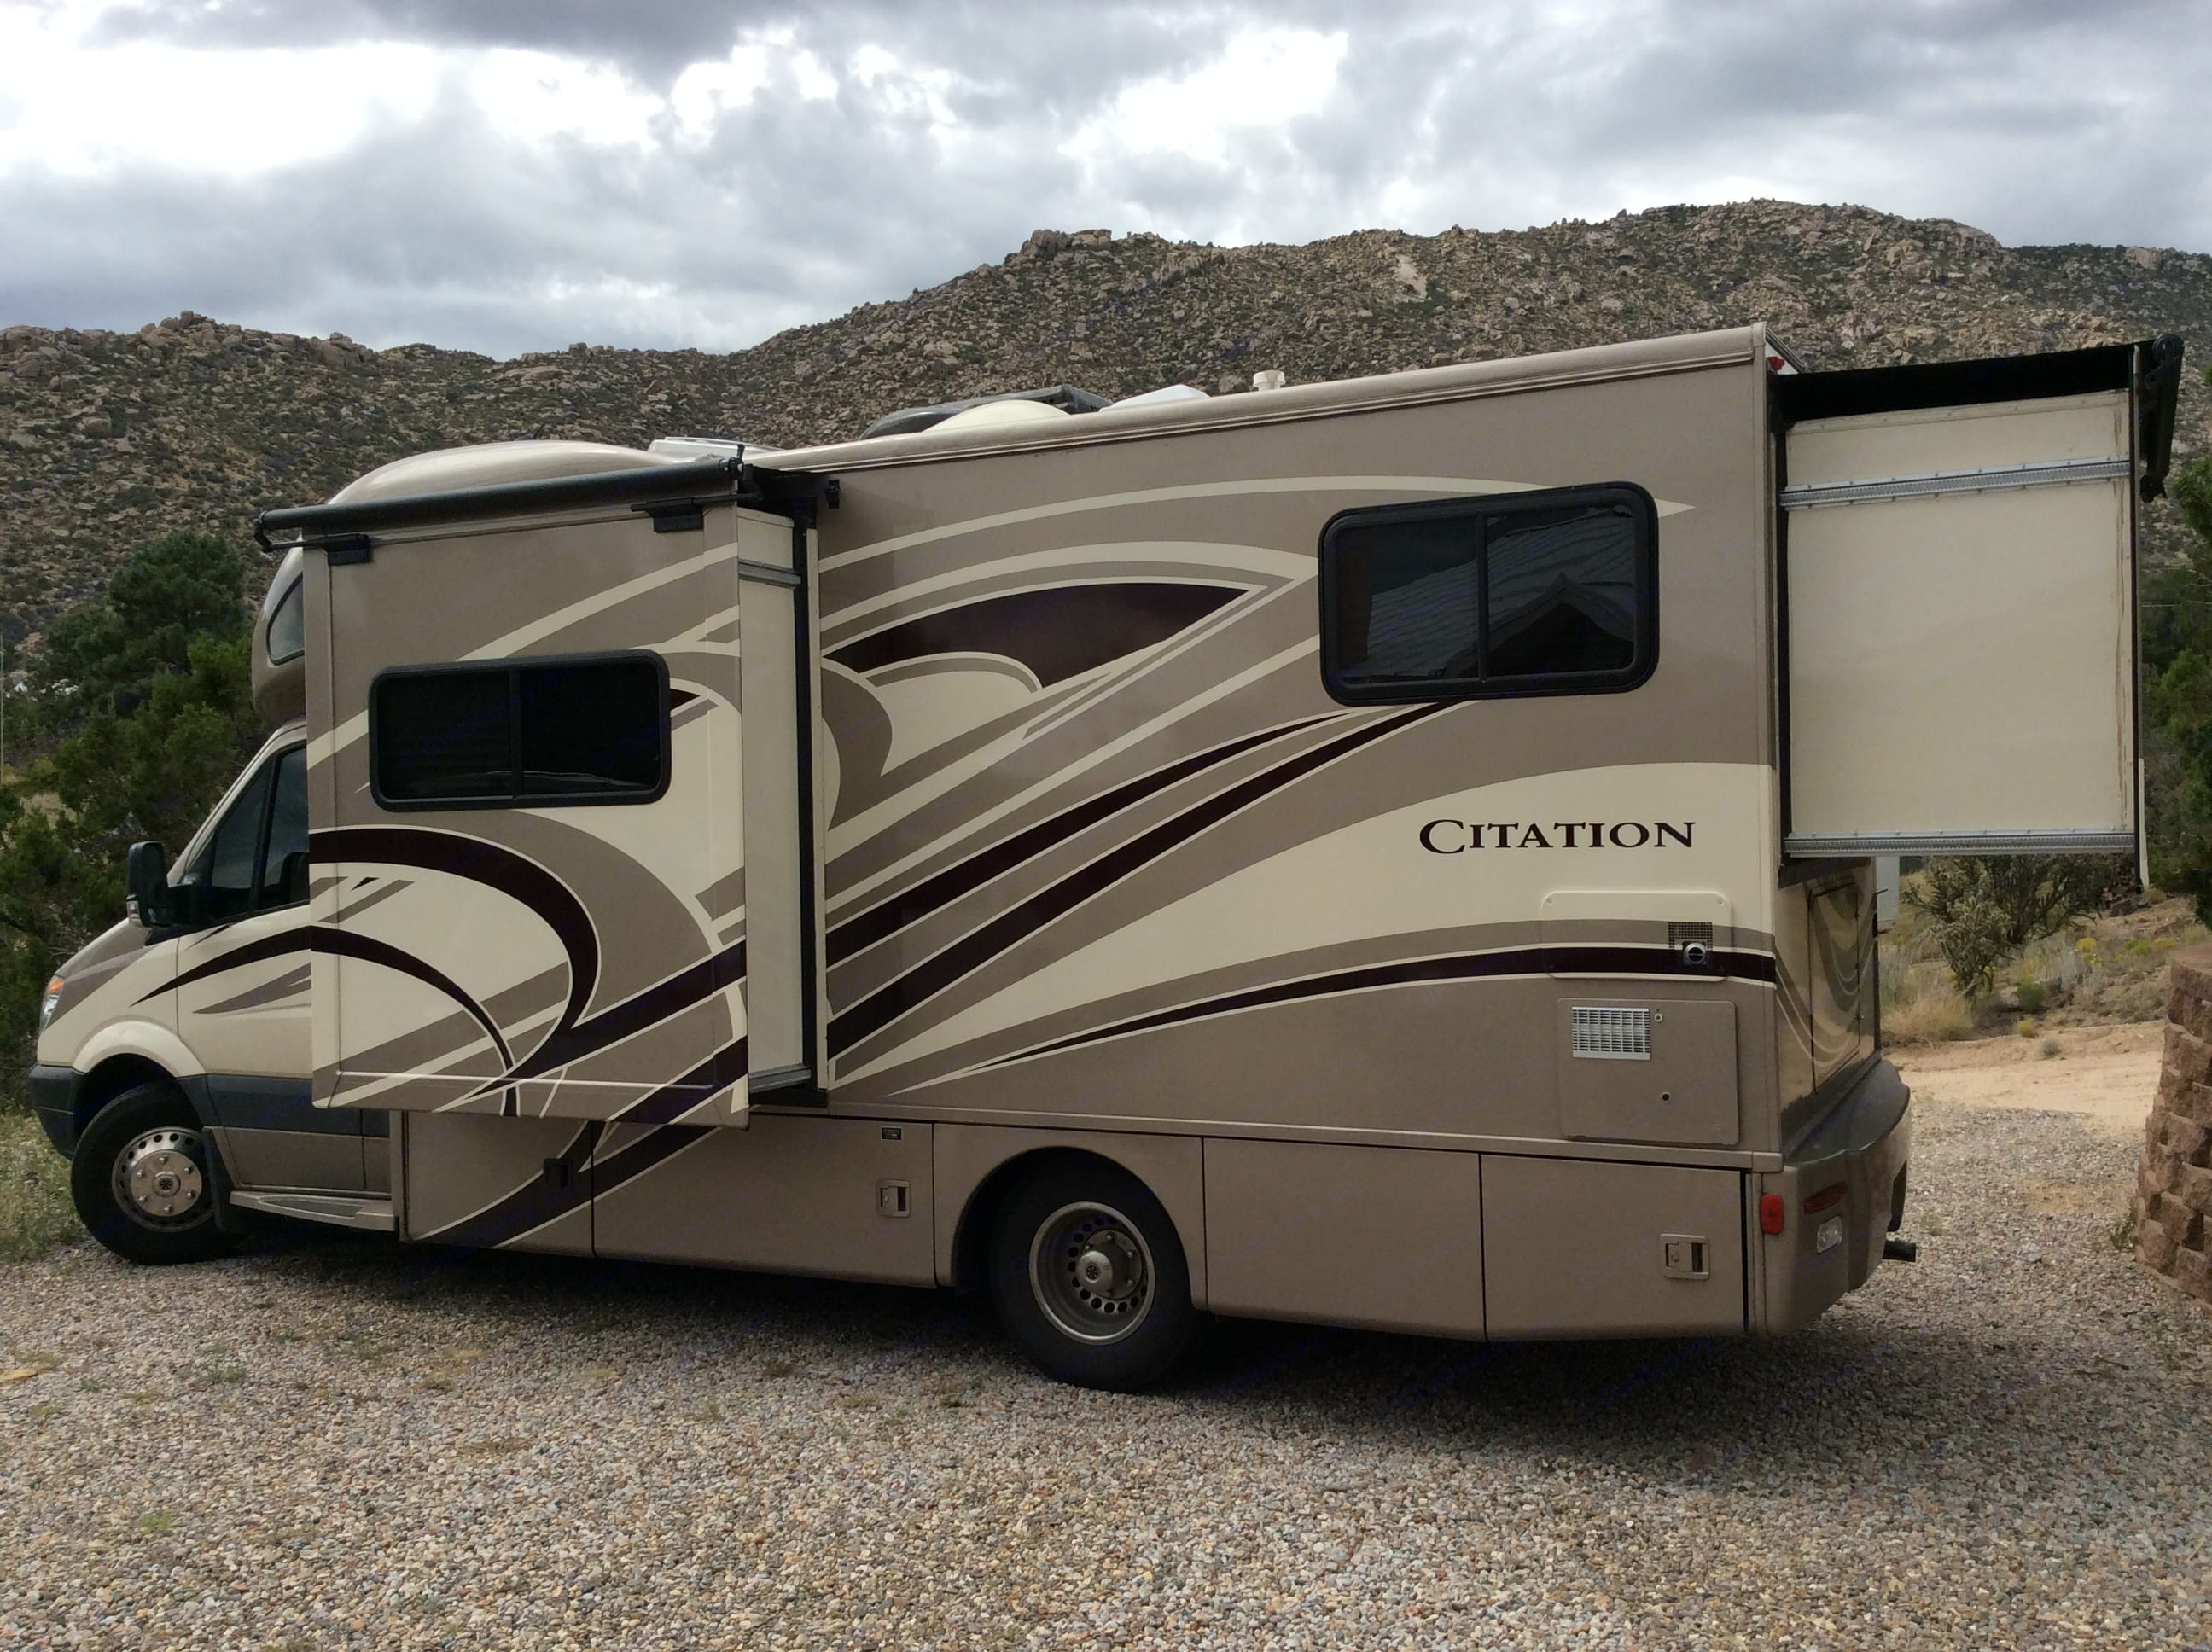 Thor Motor Coach Chateau Citation 2014